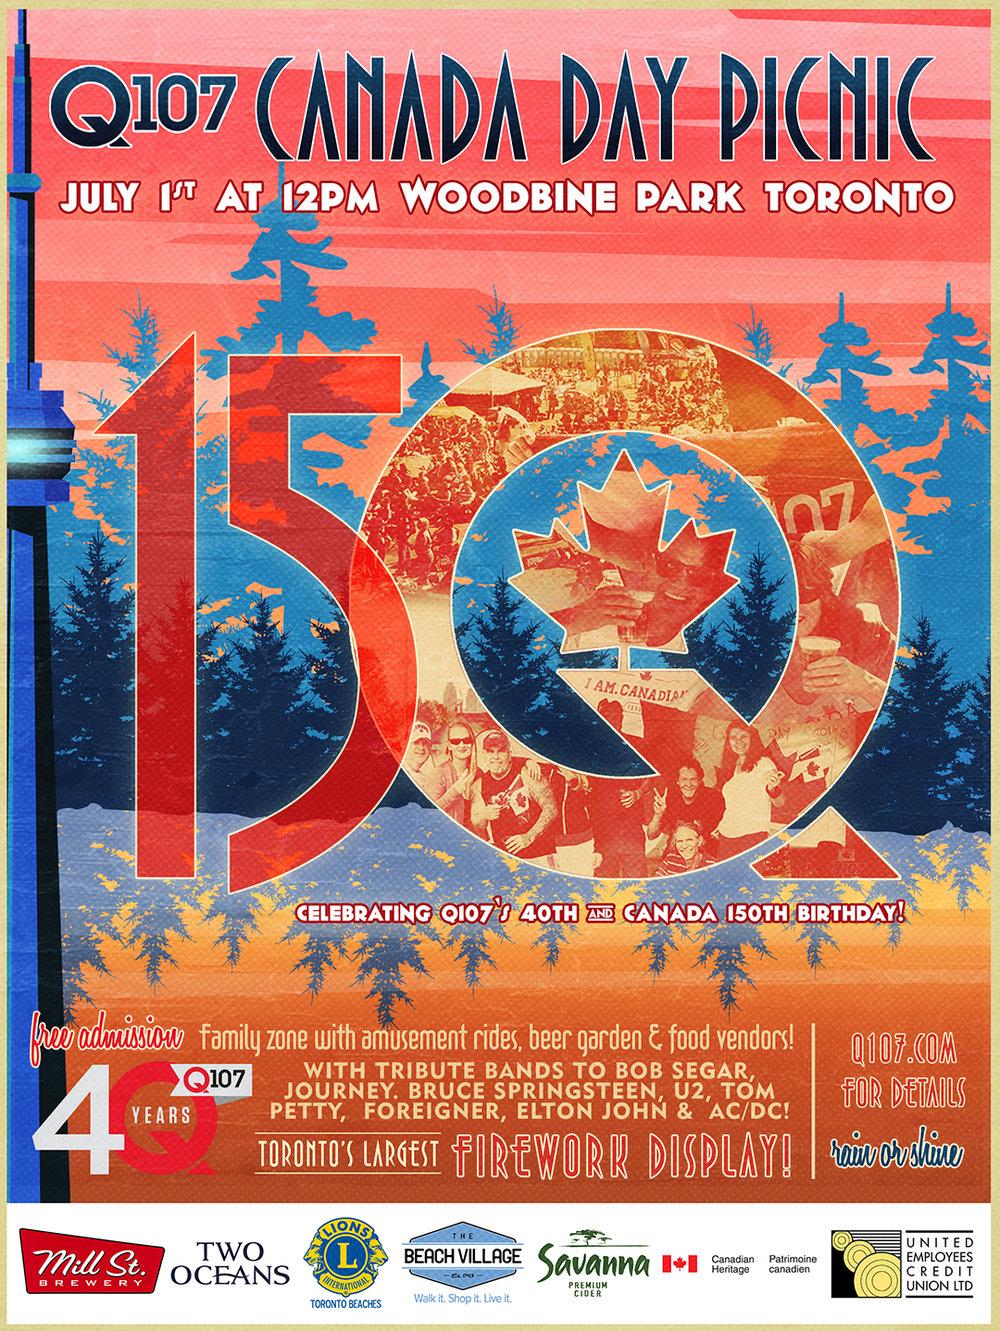 Q107 Canada Poster 2017_version 3 copy.jpg